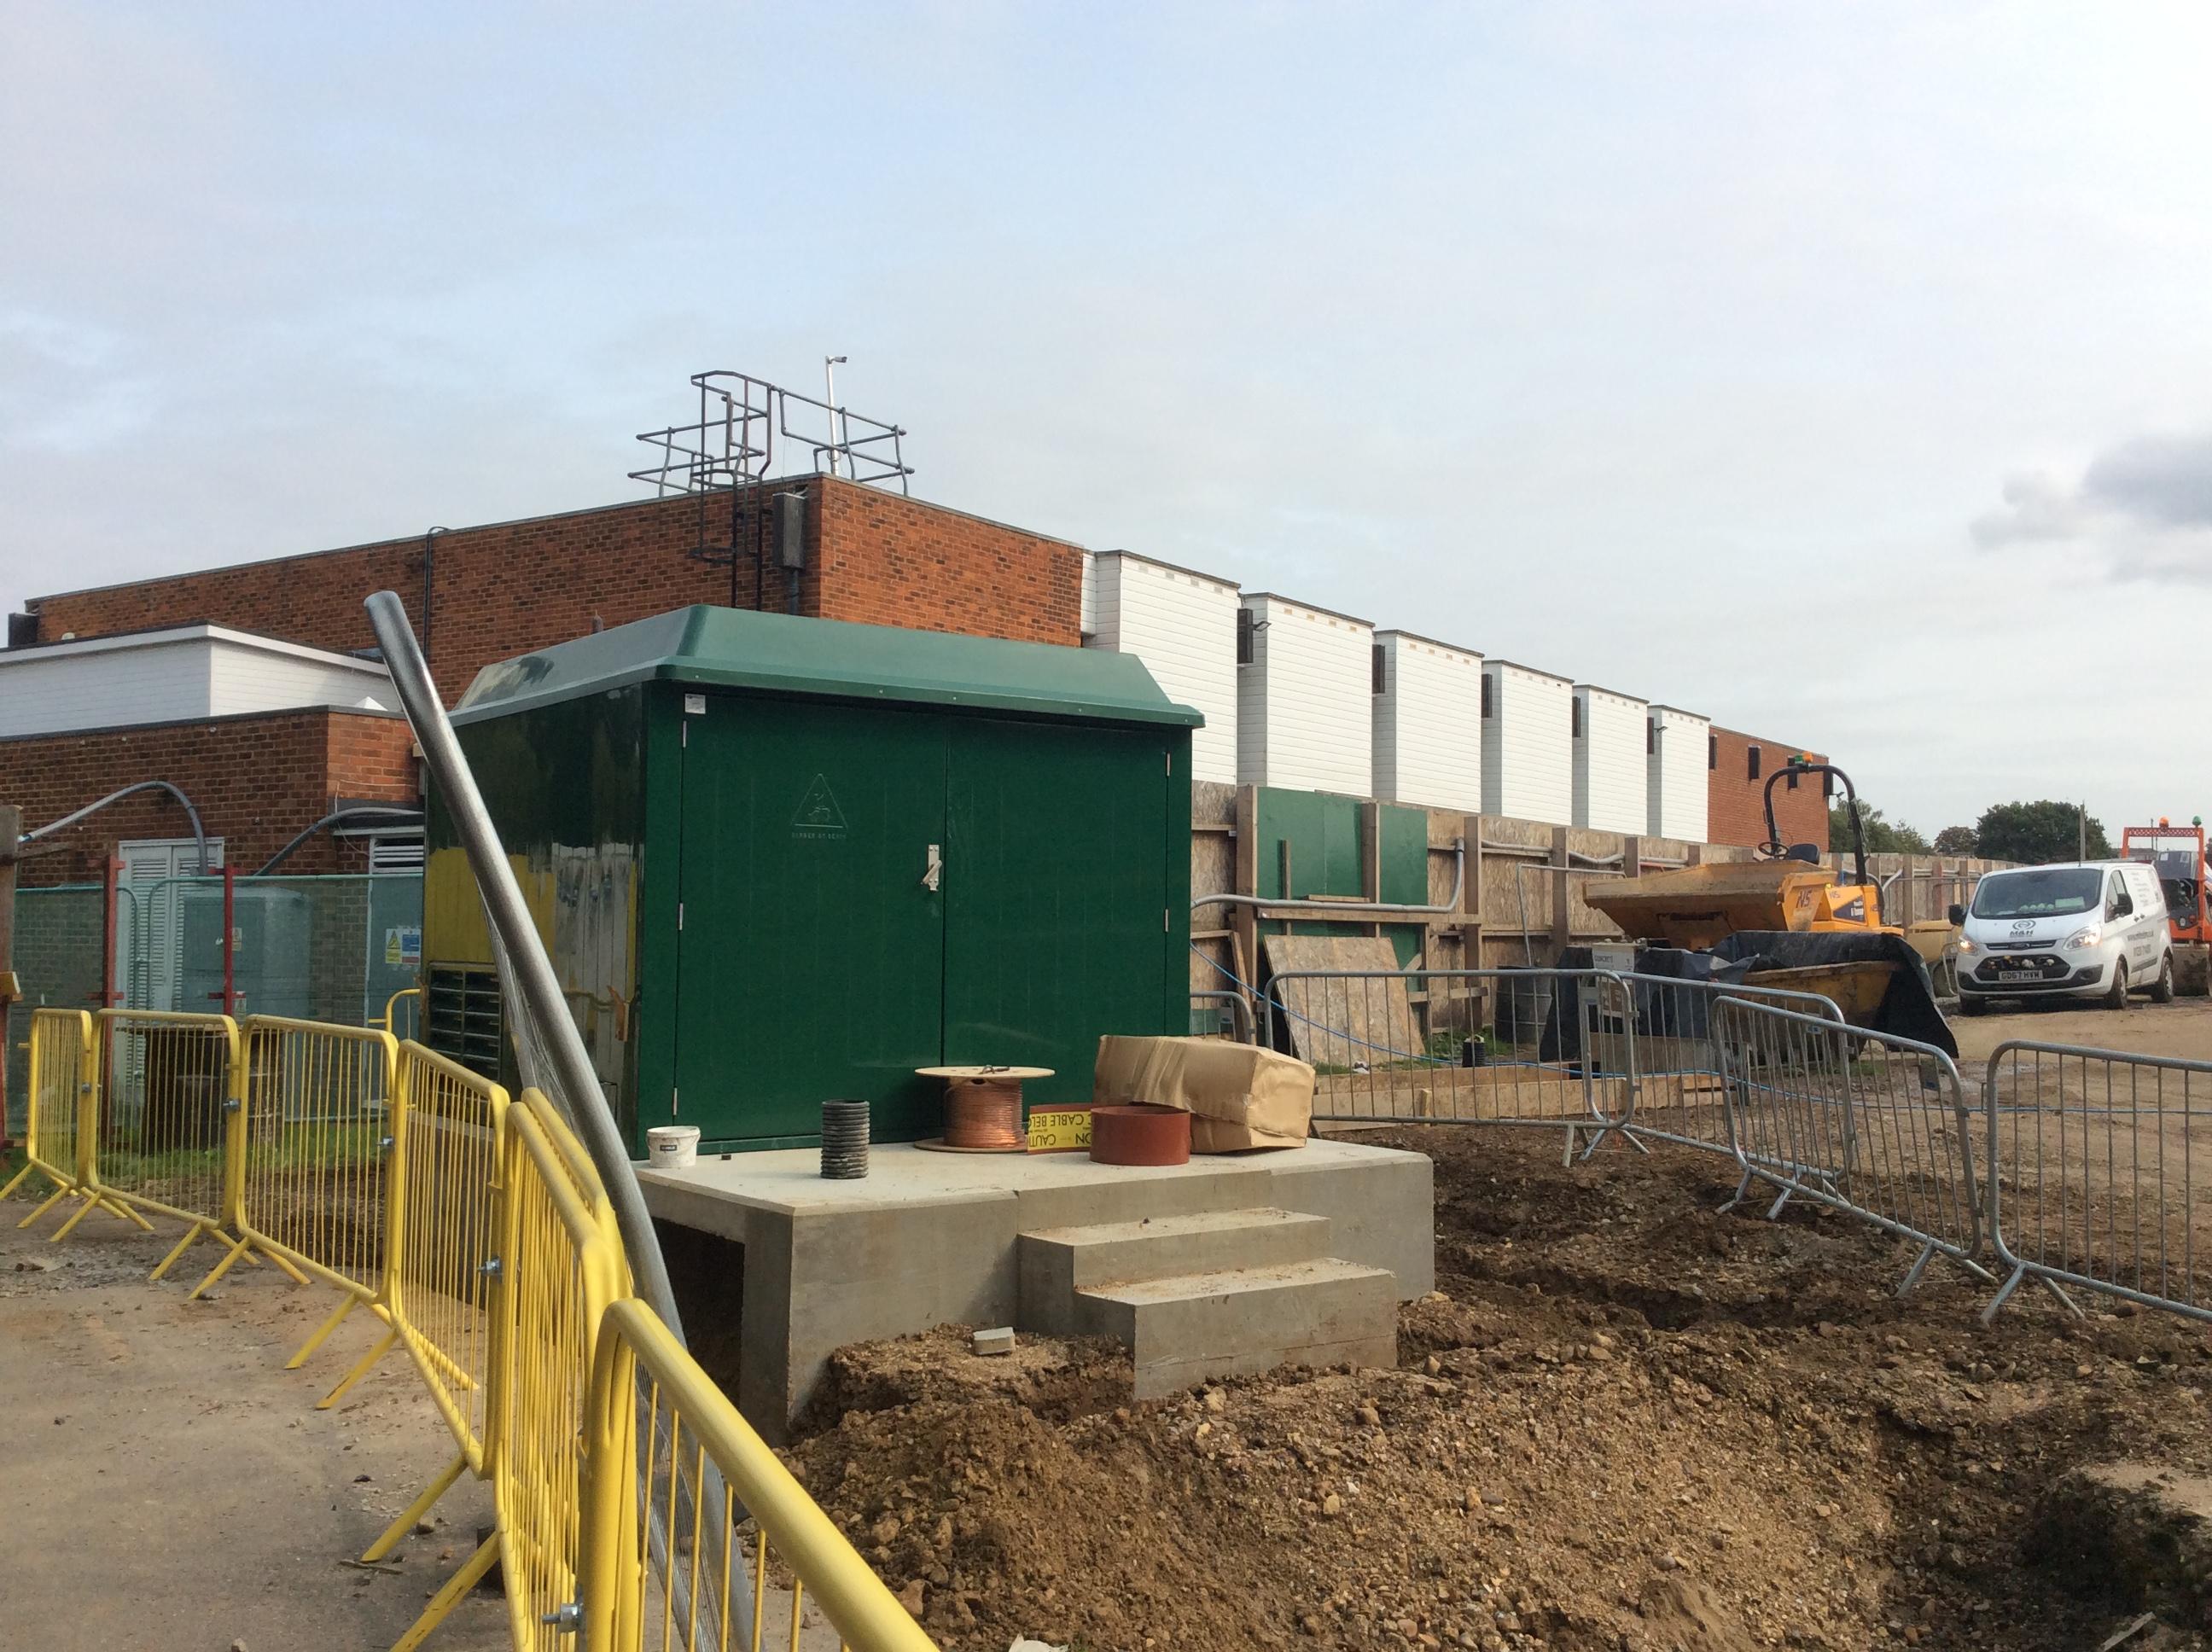 Grange Paddocks - 11.09.2020 - new substation